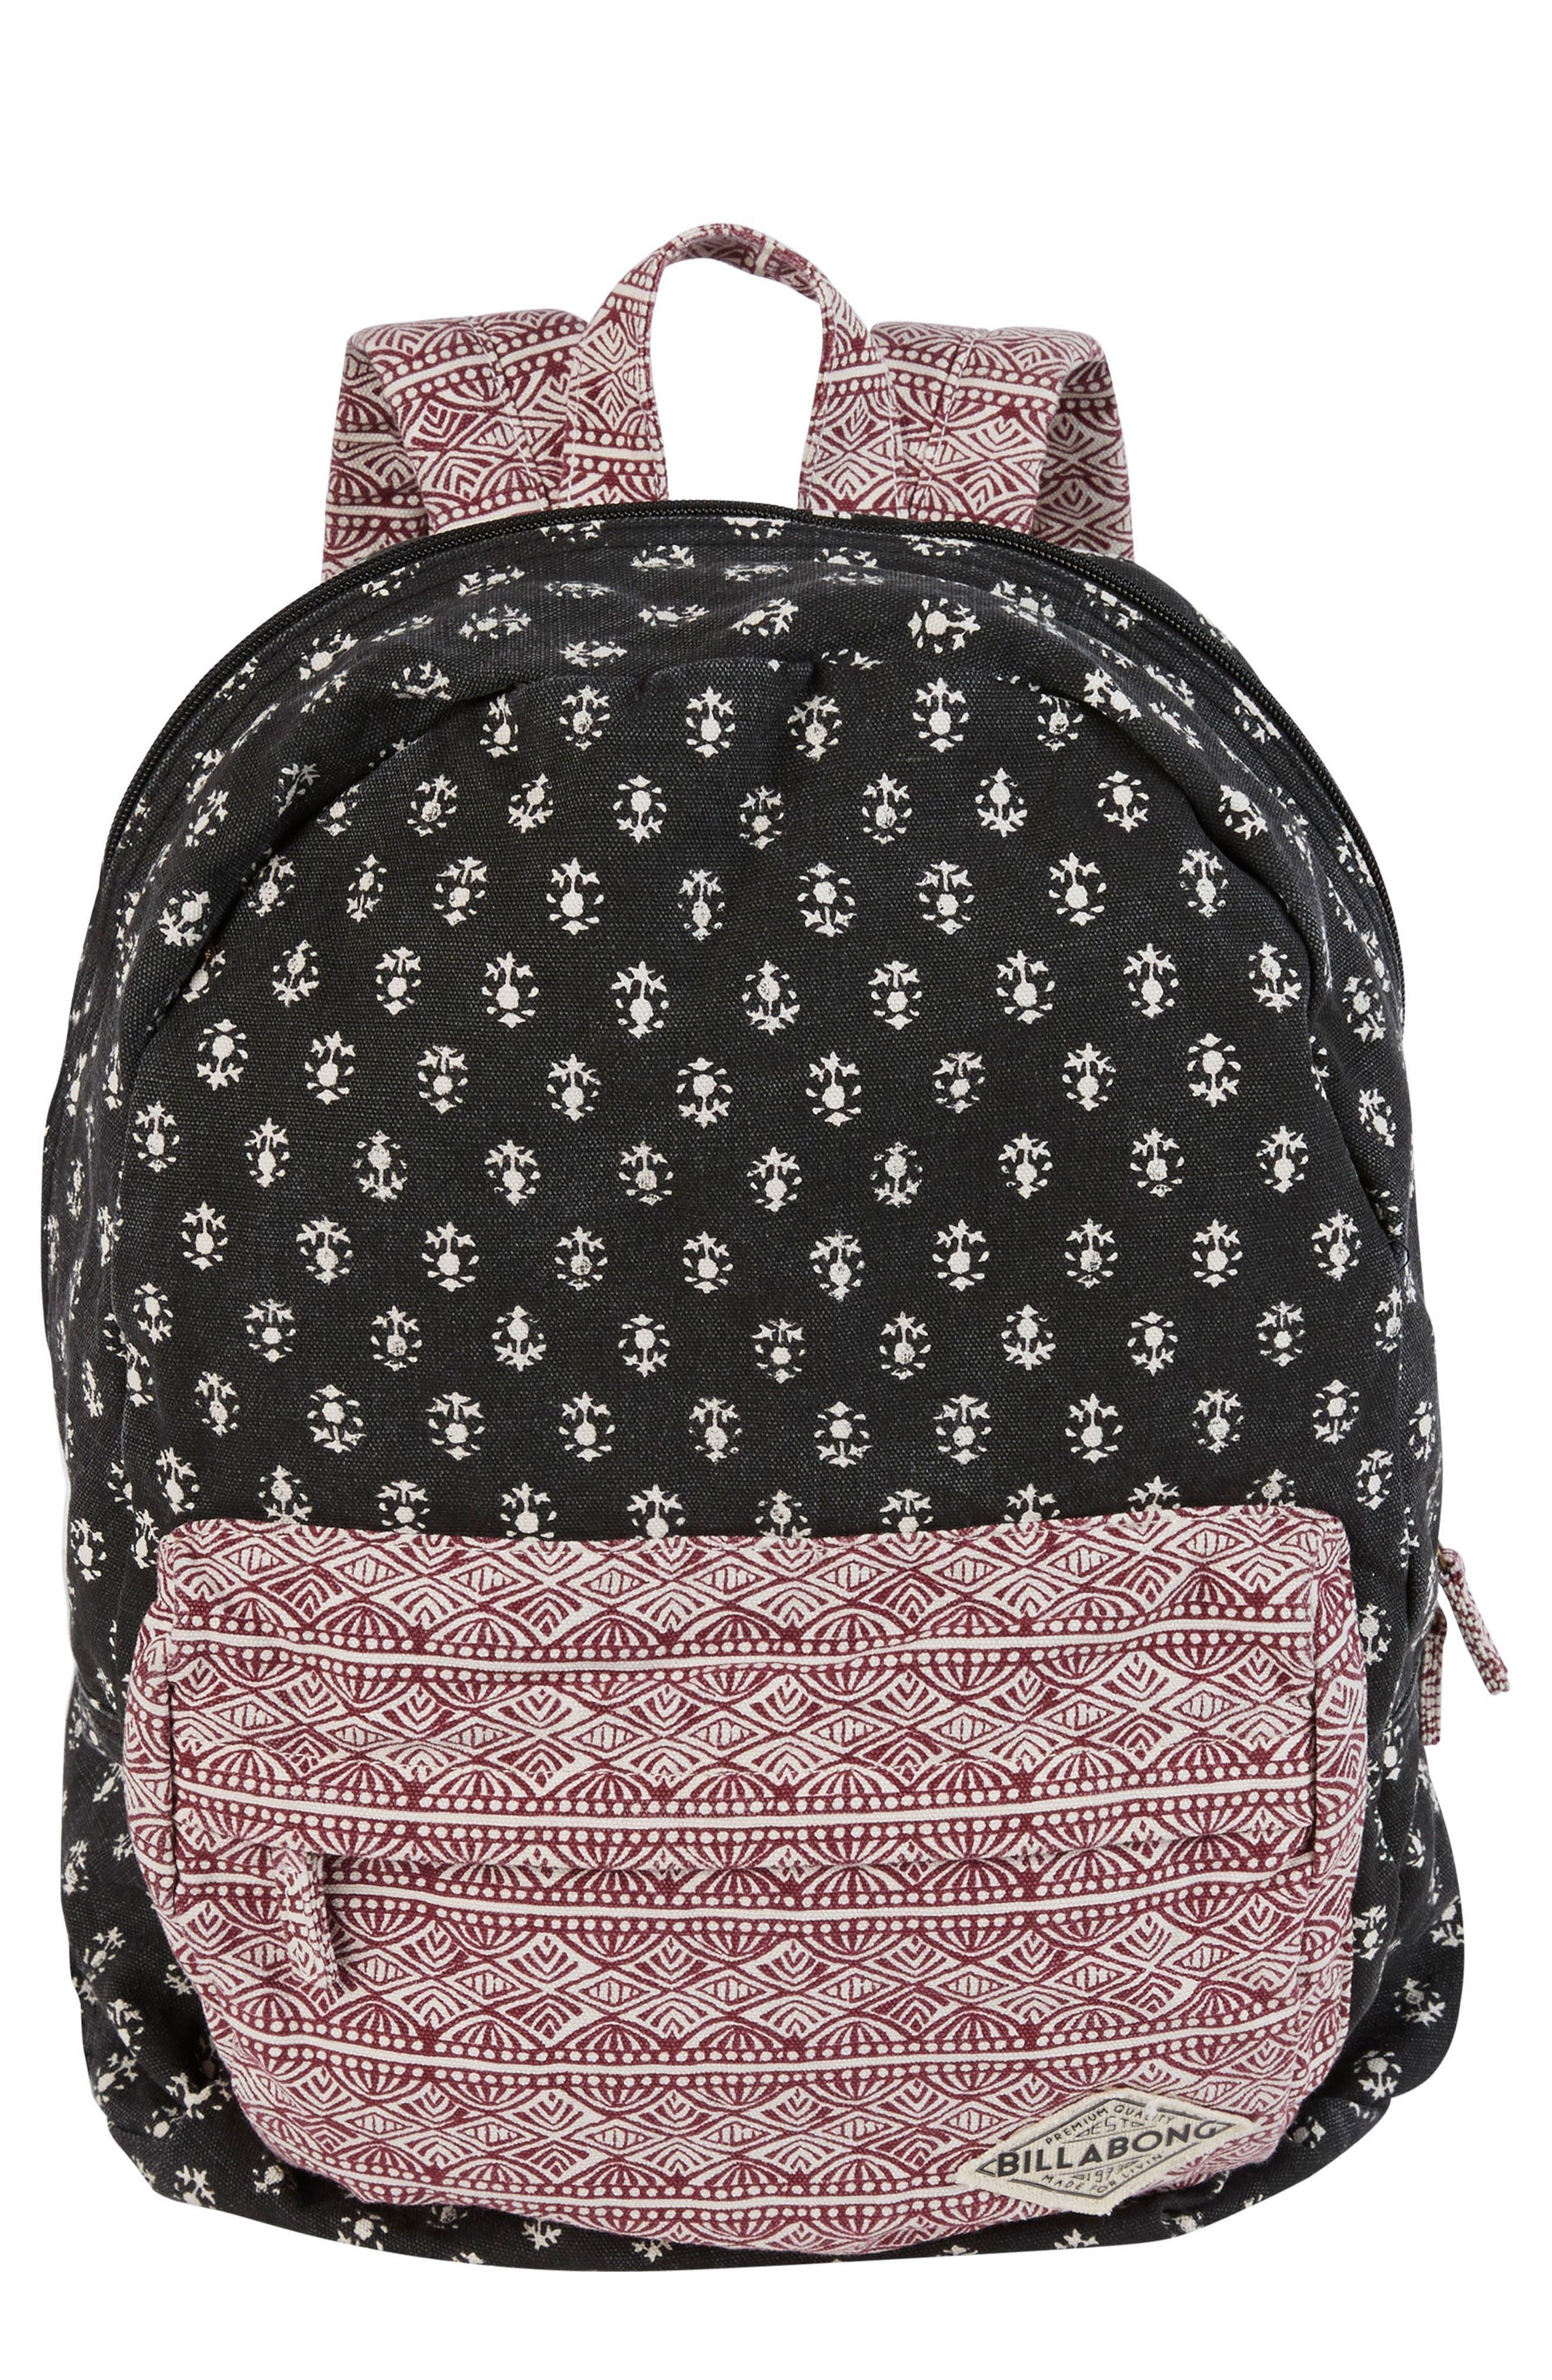 Billabong 'Hand Over Love' Backpack